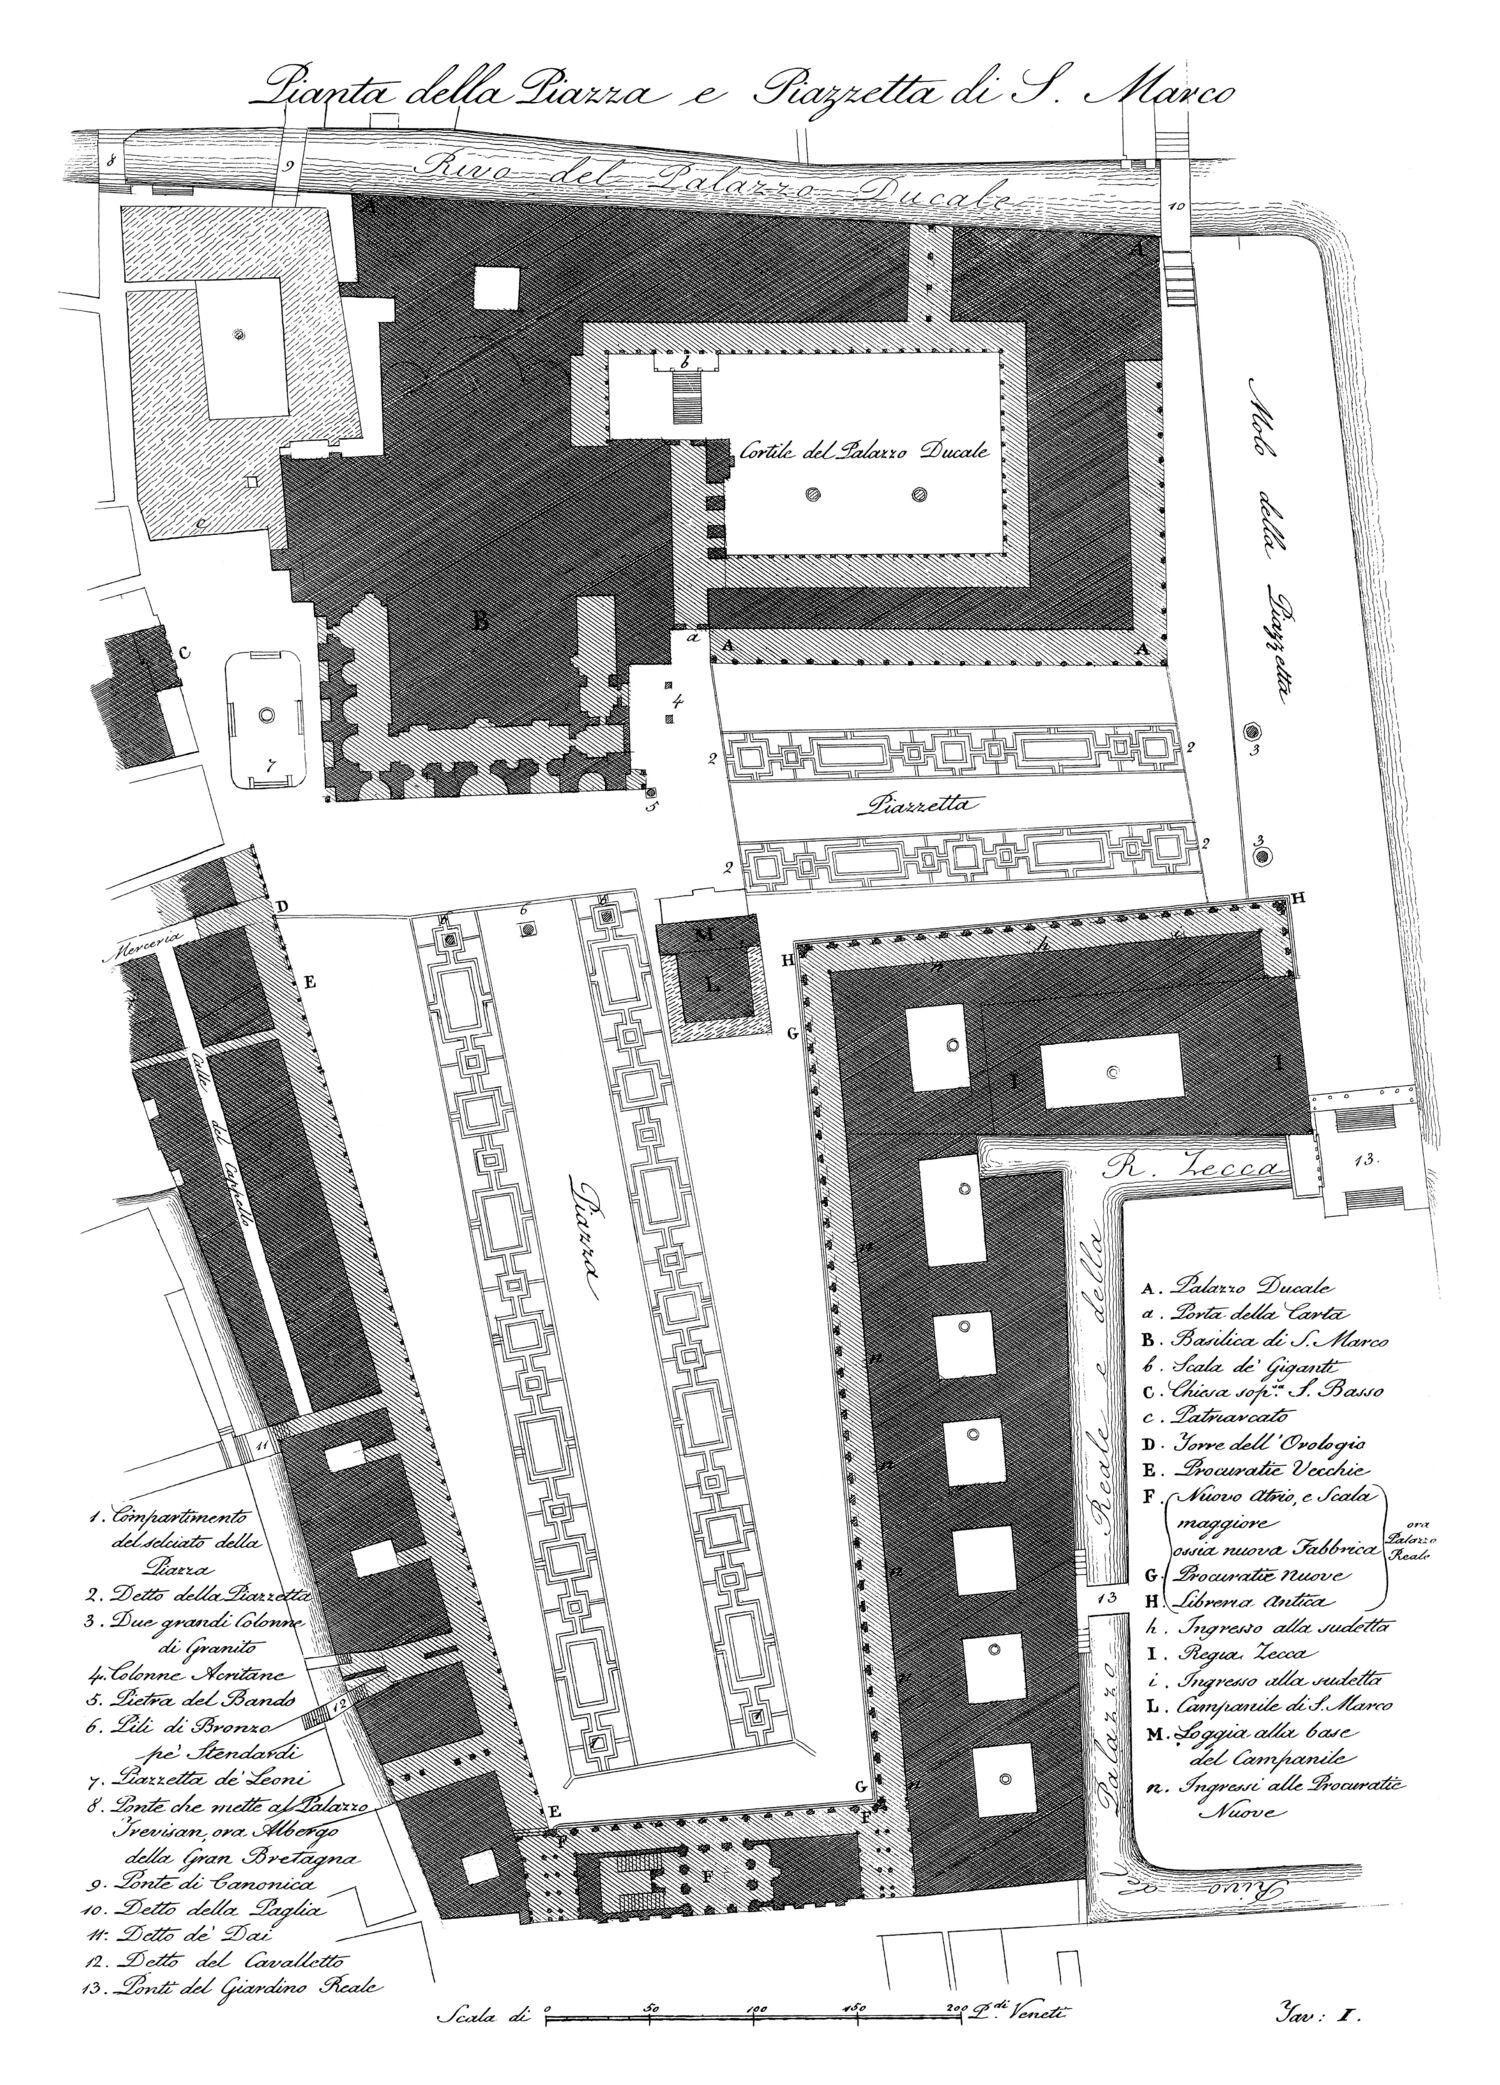 Quadri-Moretti, Piazza San Marco (1831), 01.jpg